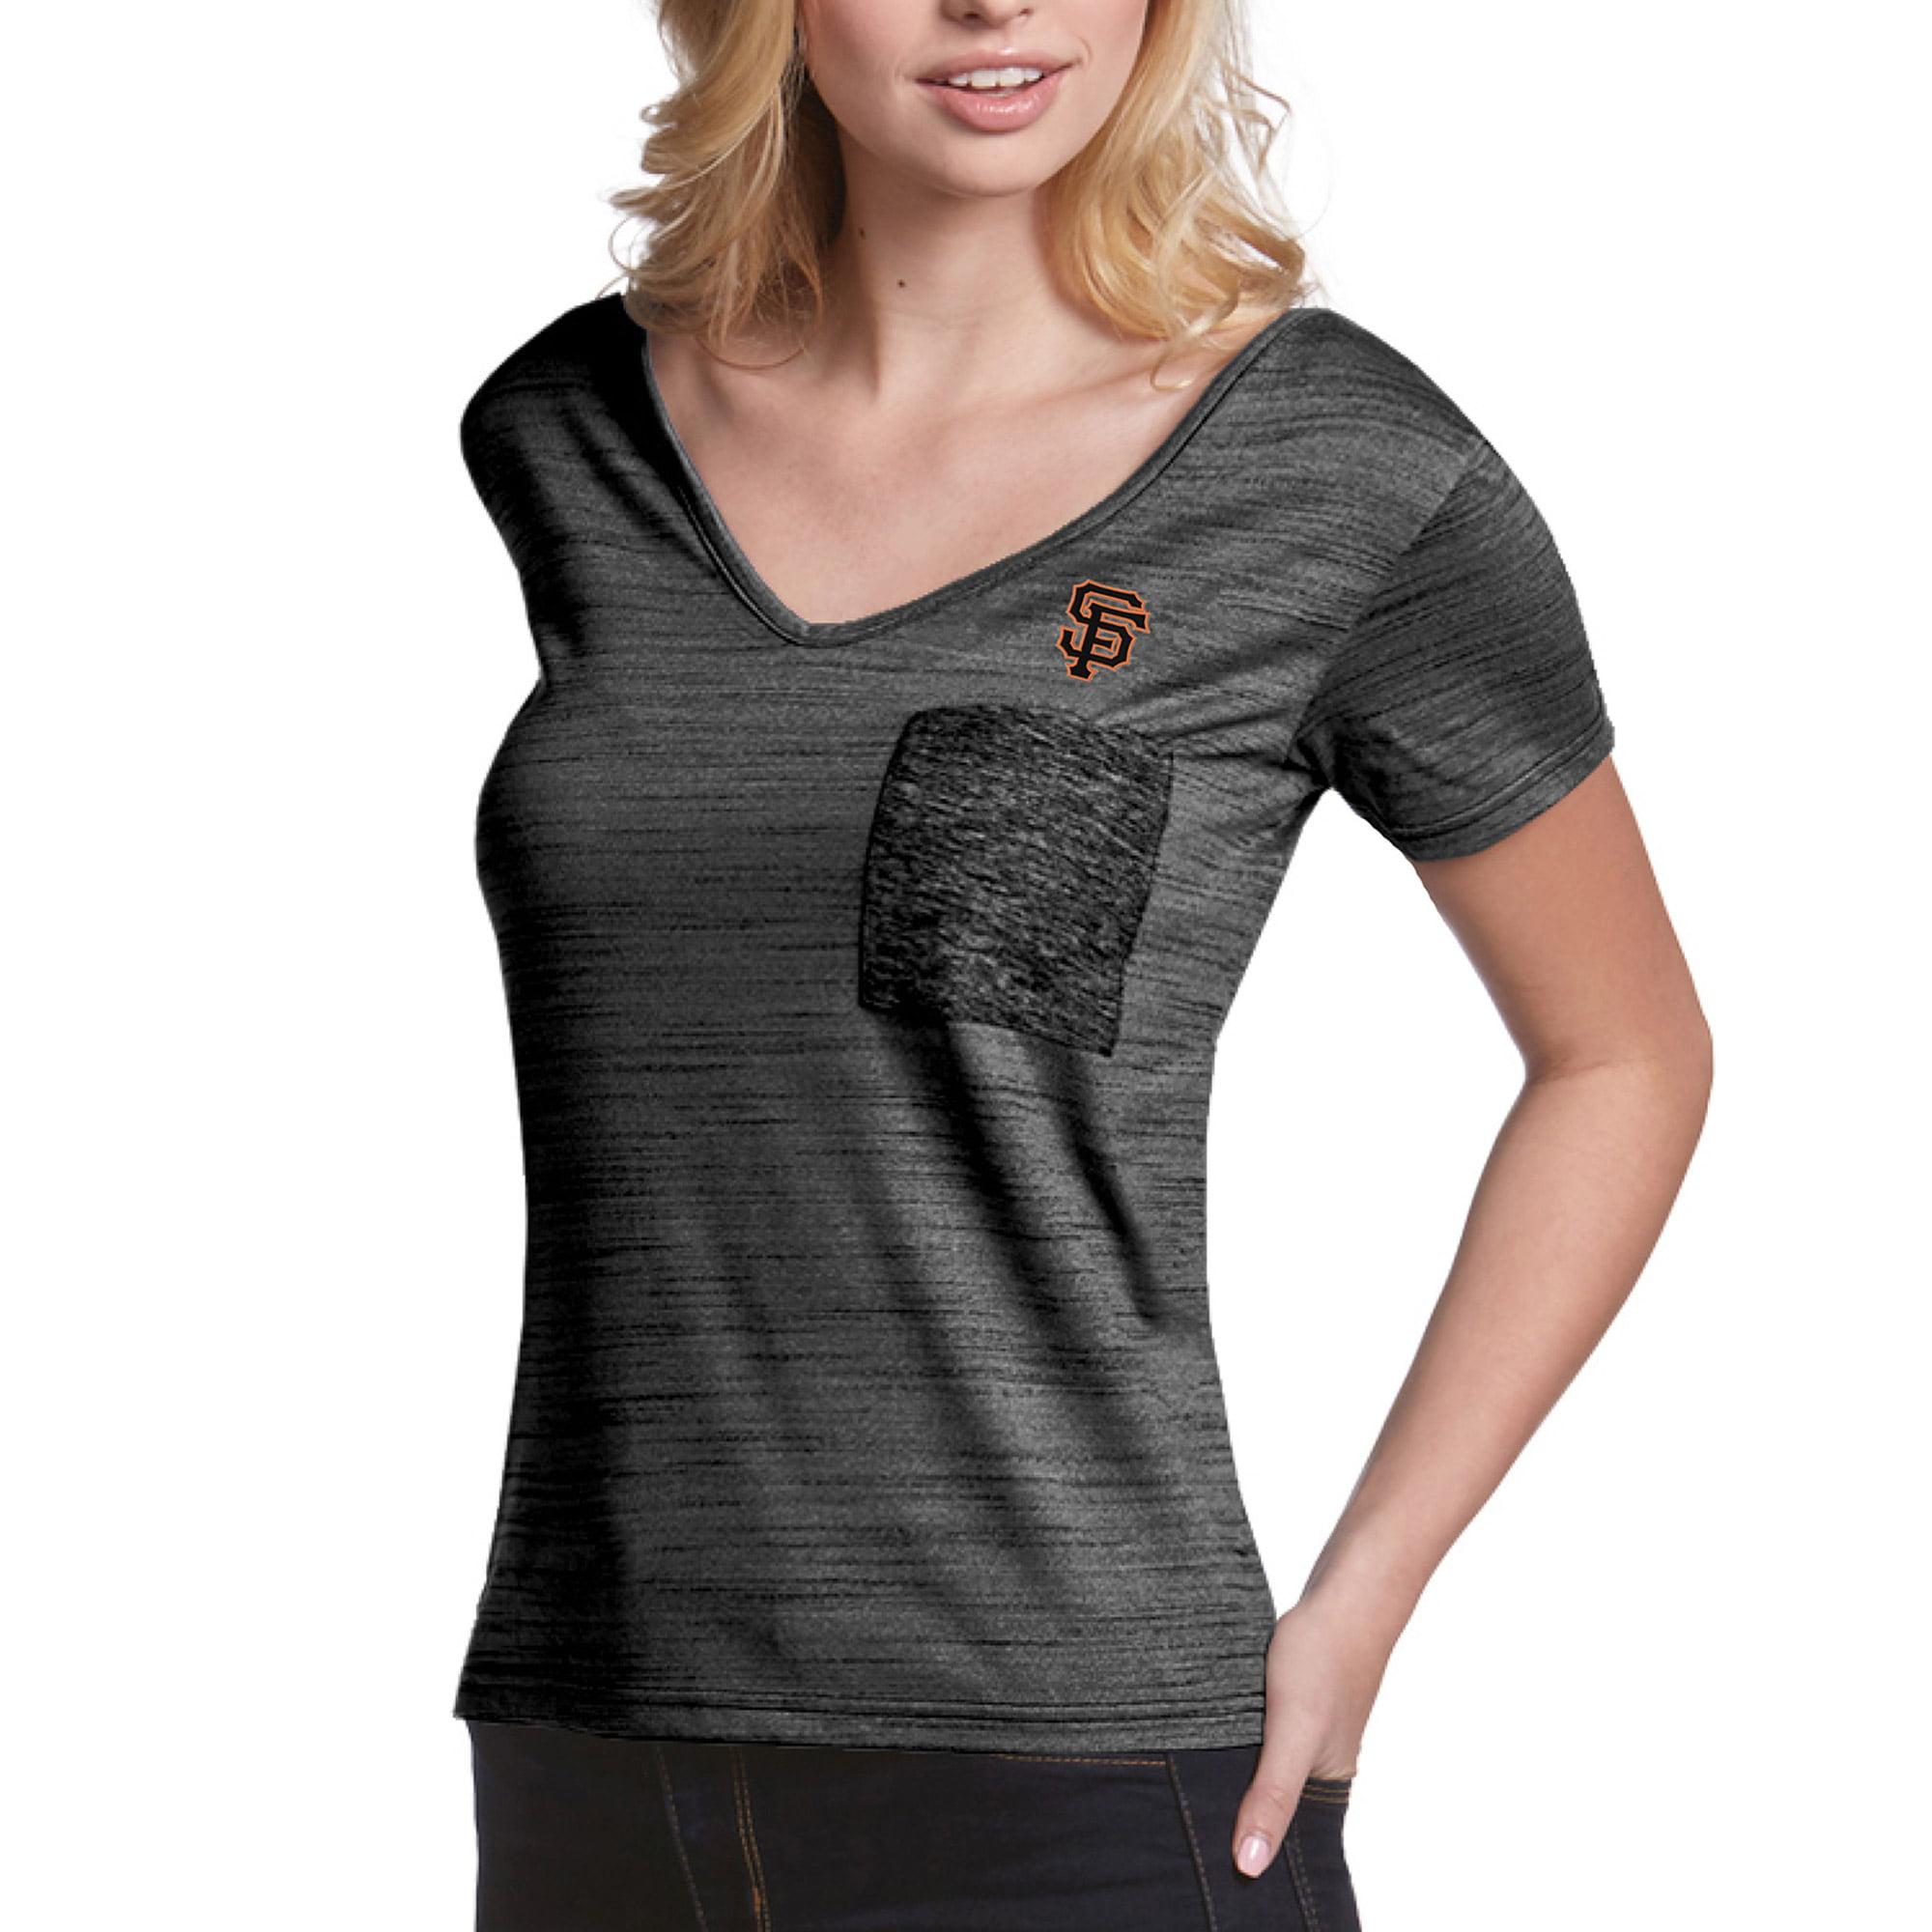 San Francisco Giants Antigua Women's Form Pocket T-Shirt - Black